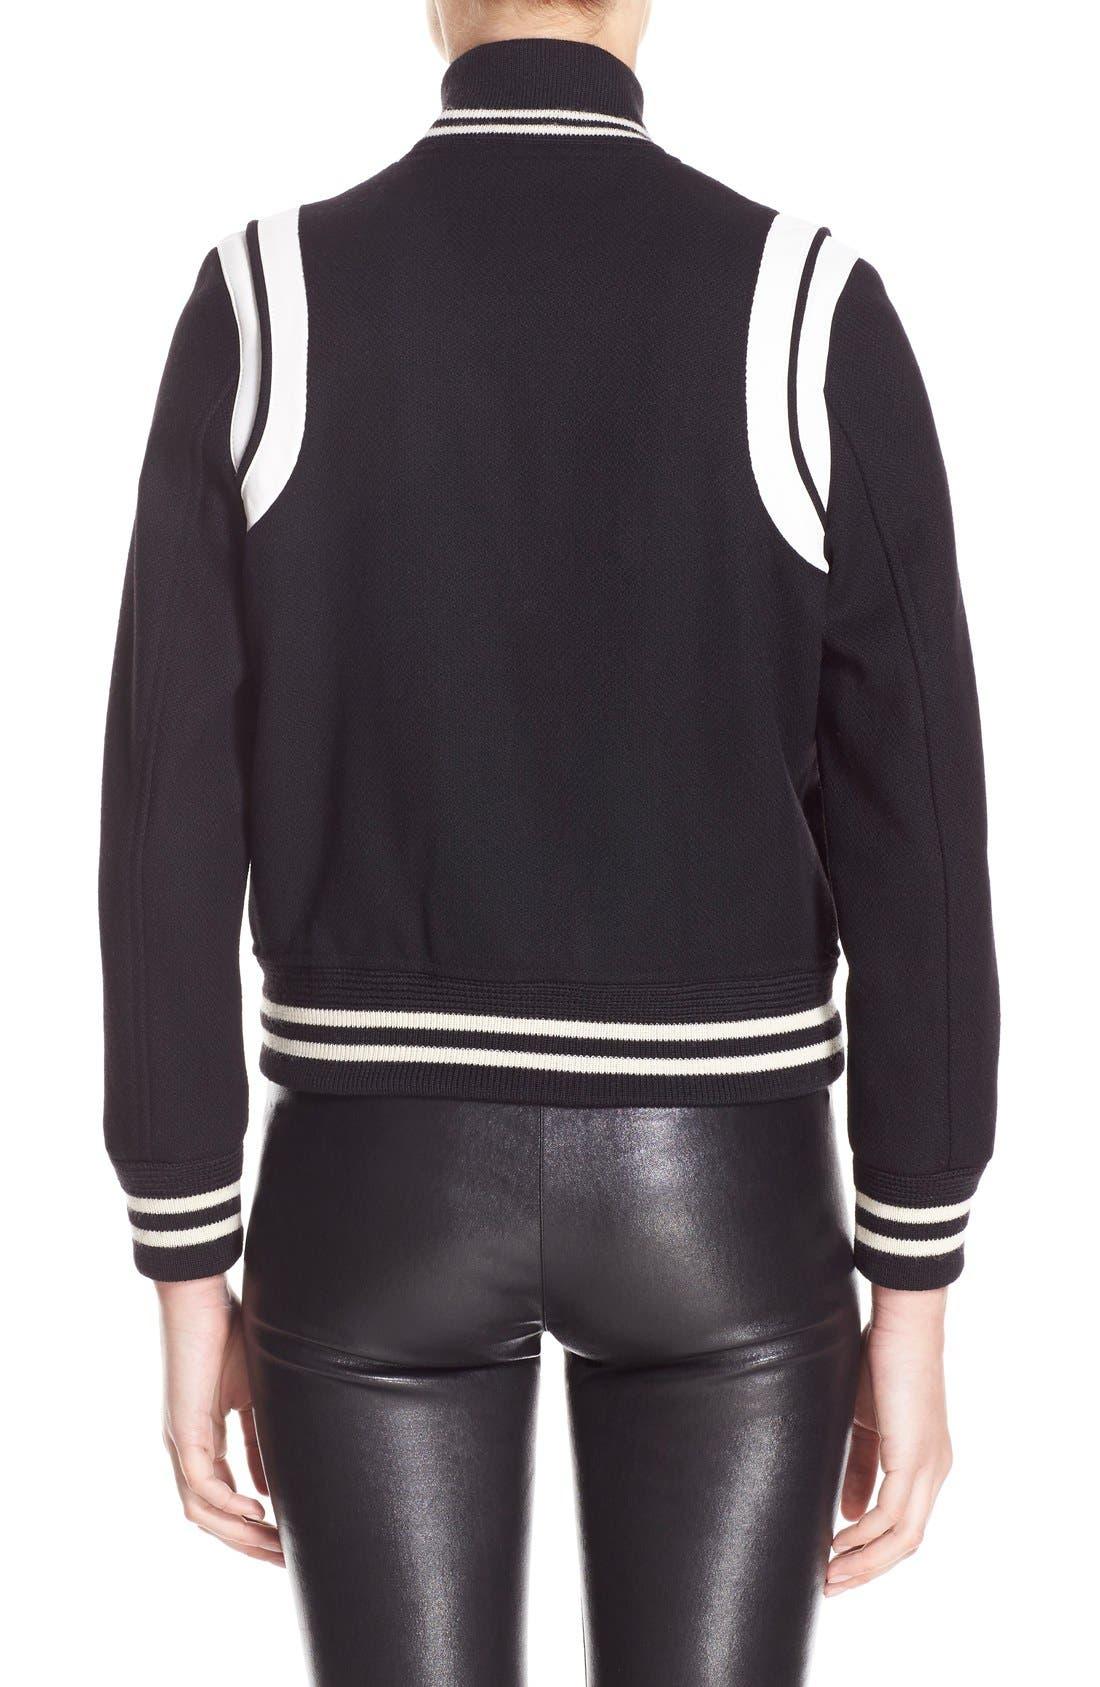 Alternate Image 2  - Saint Laurent 'Teddy' White Leather Trim Bomber Jacket